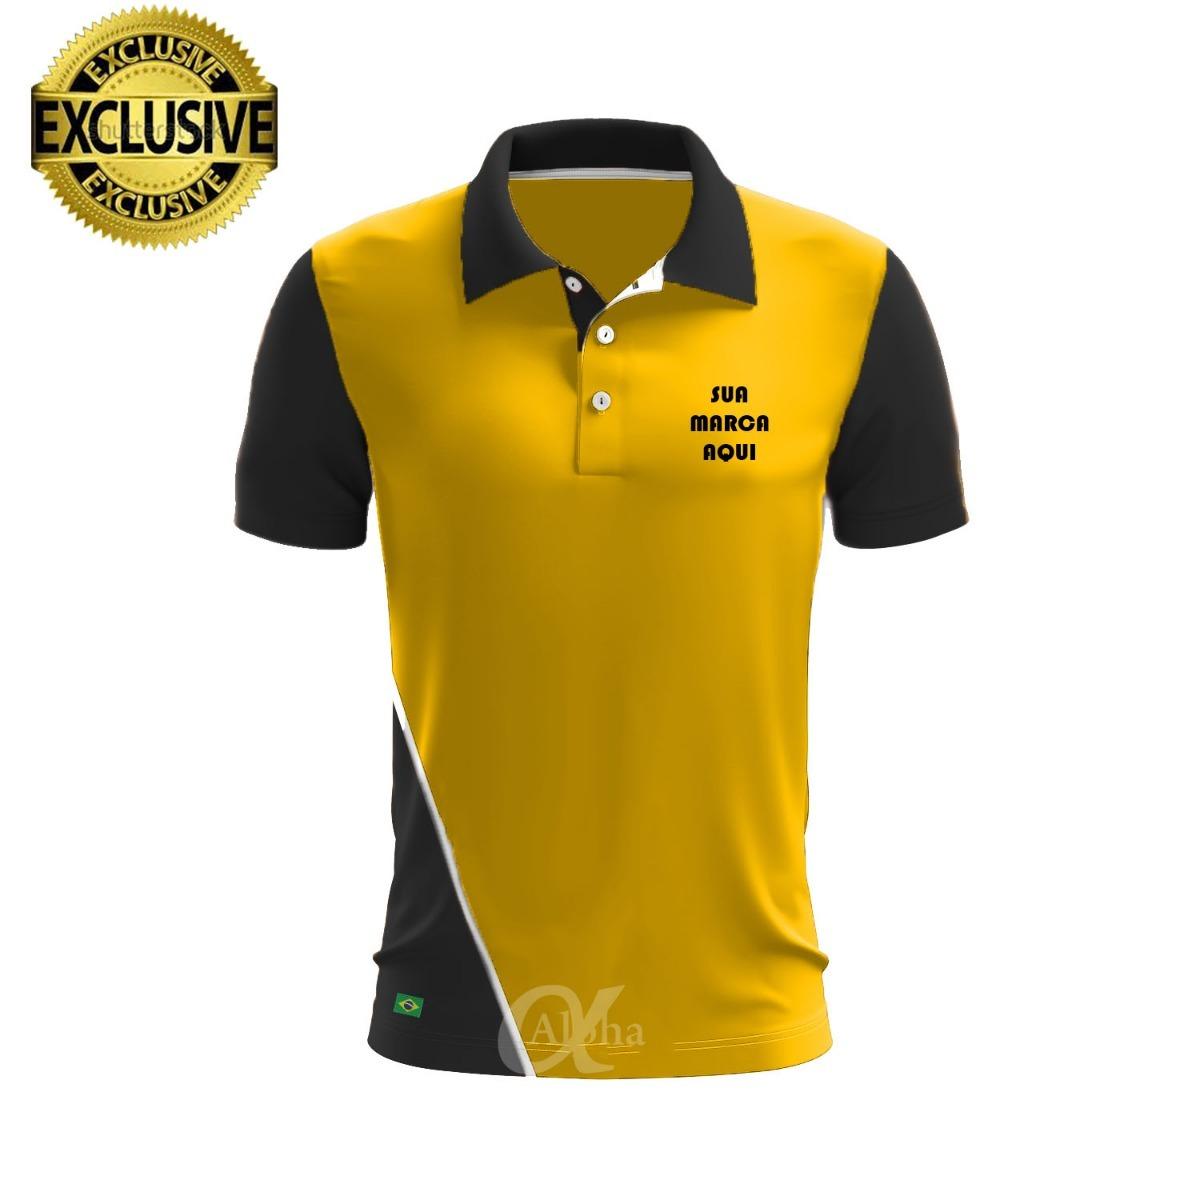 9cde0cfbf3 camiseta polo personalizada uniformes kit 37 peças. Carregando zoom.